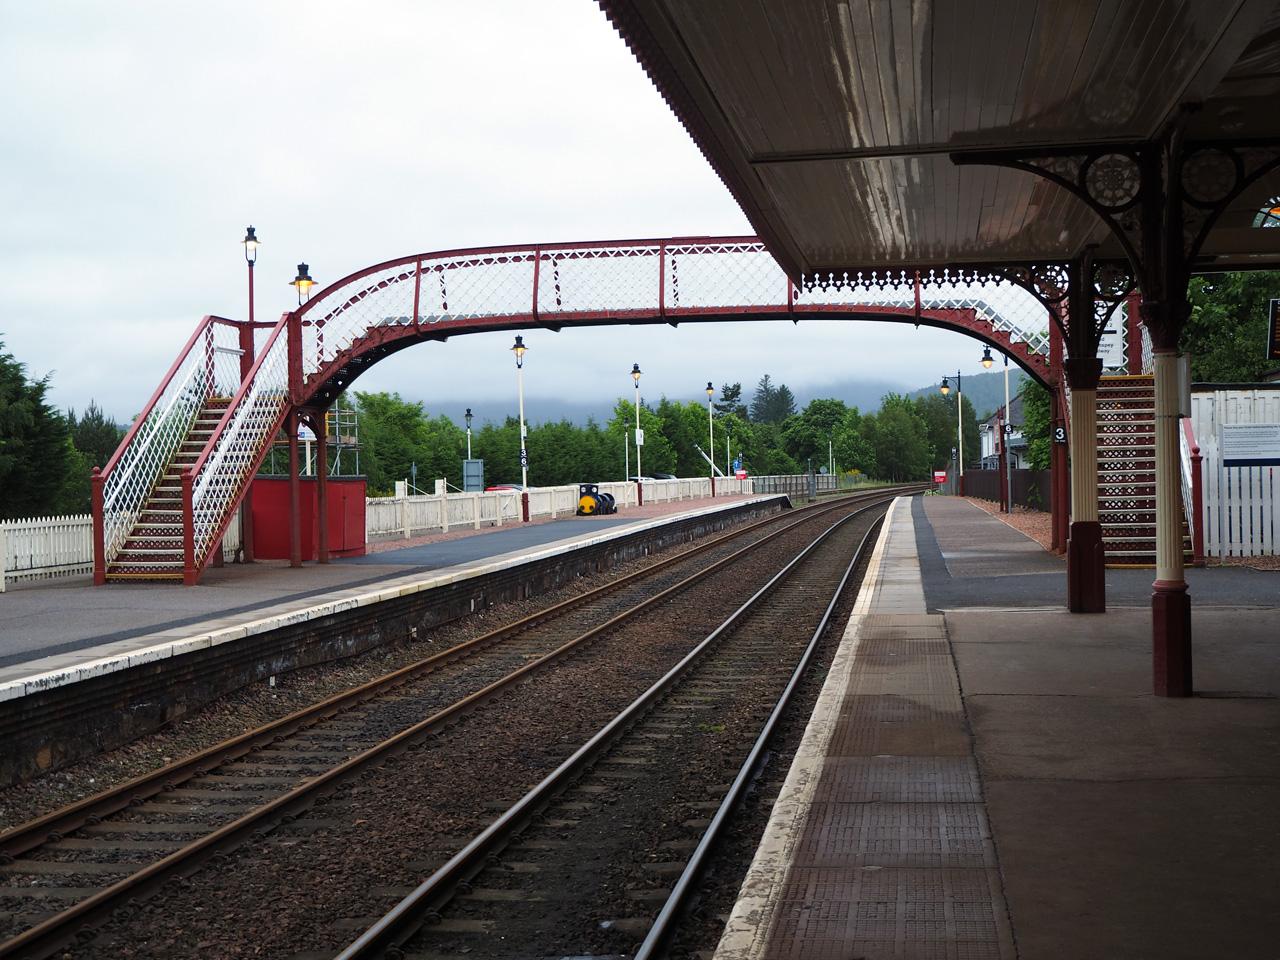 Railwey station Aviemore Cairngorms